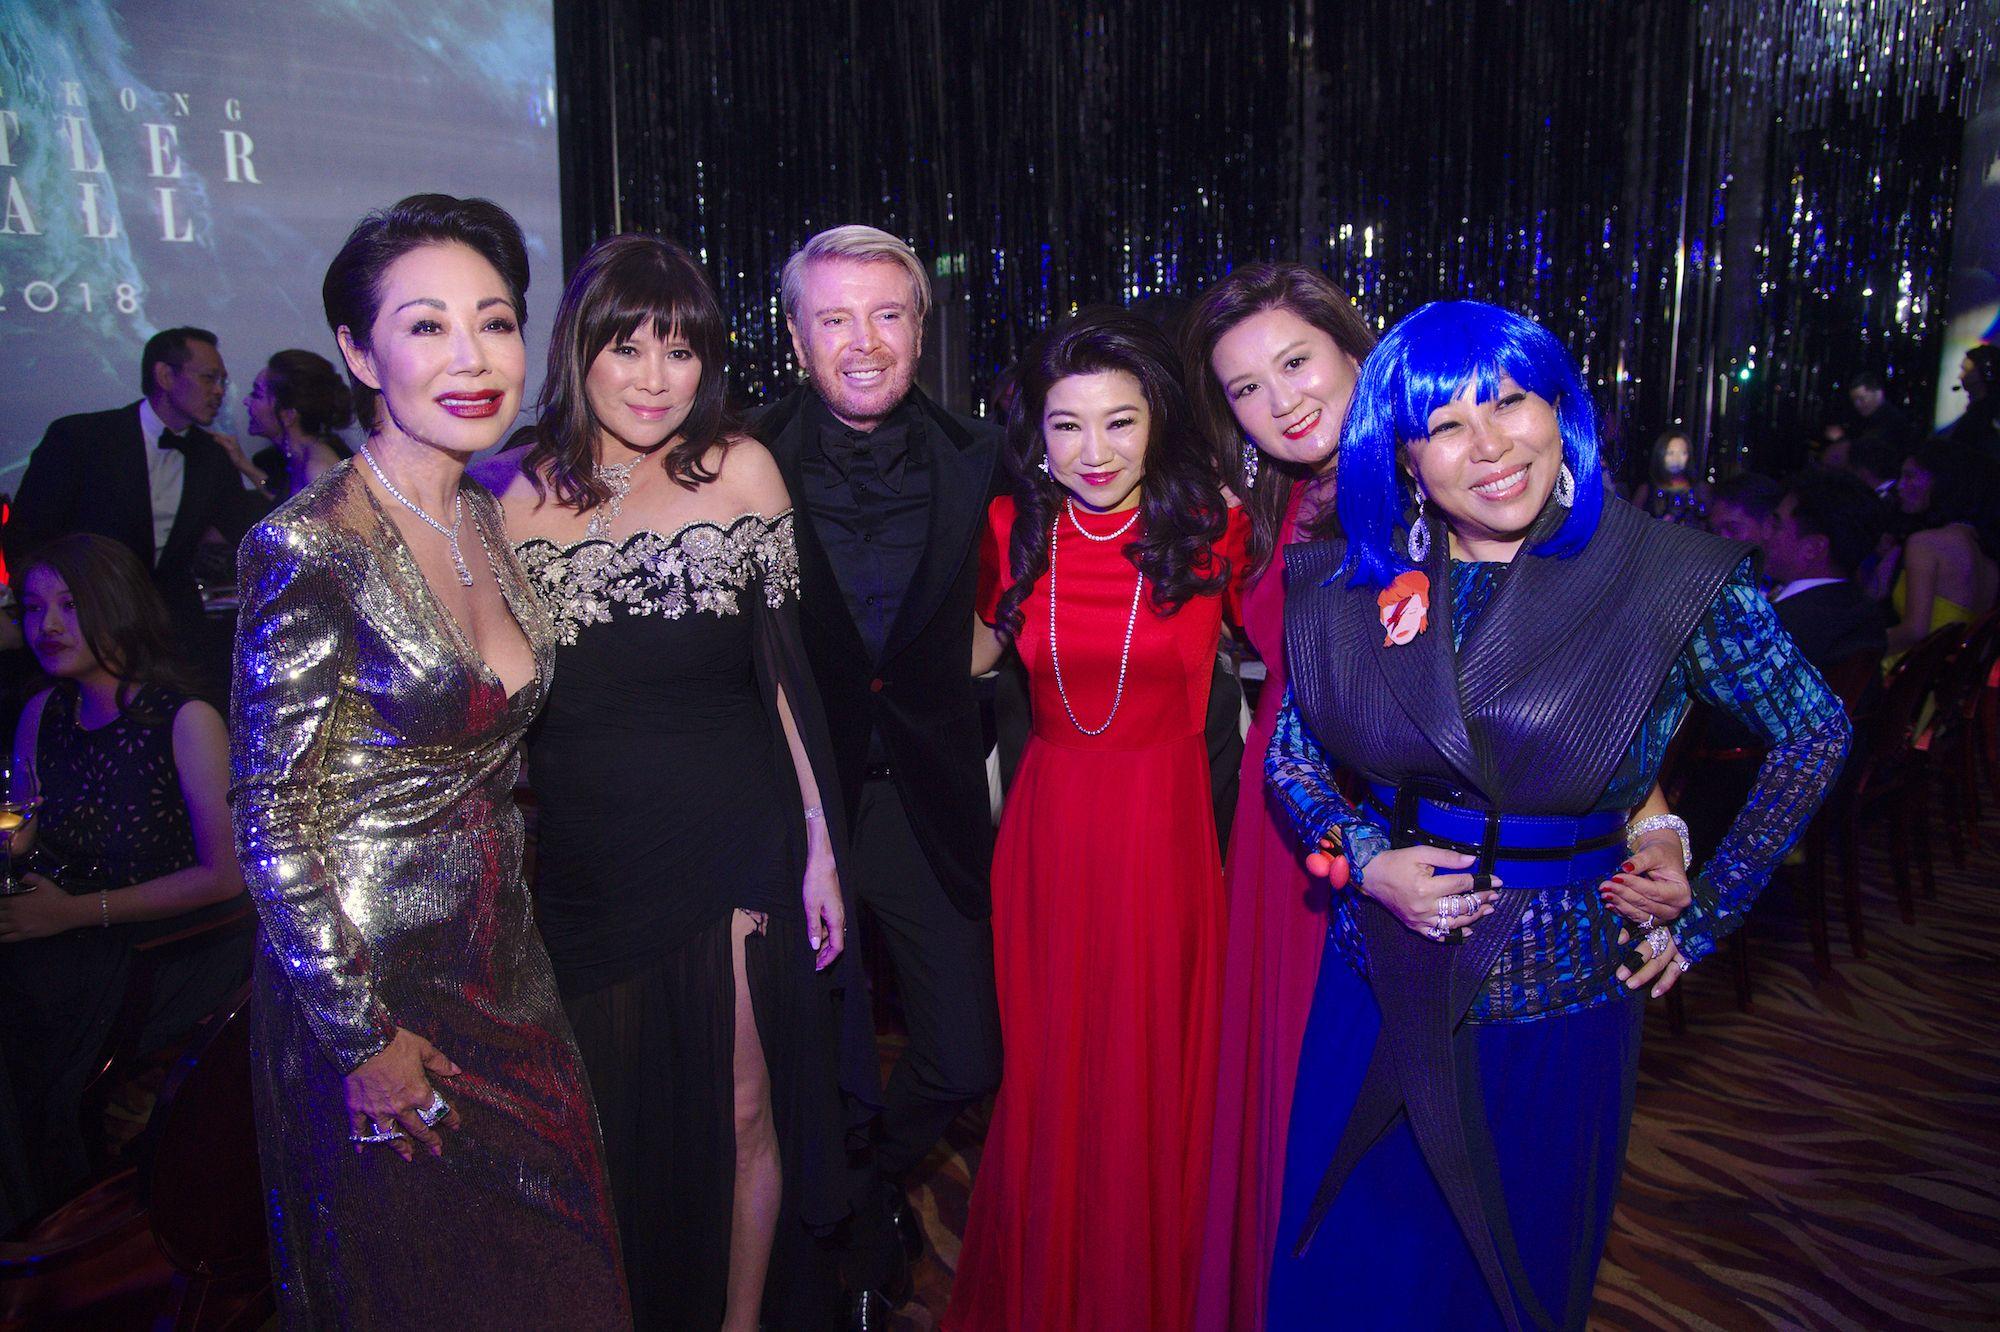 Bonnae Gokson, Yvette Yung, Kim Robinson, Vanessa Kwan, Jean Chan, Lumen Kinoshita